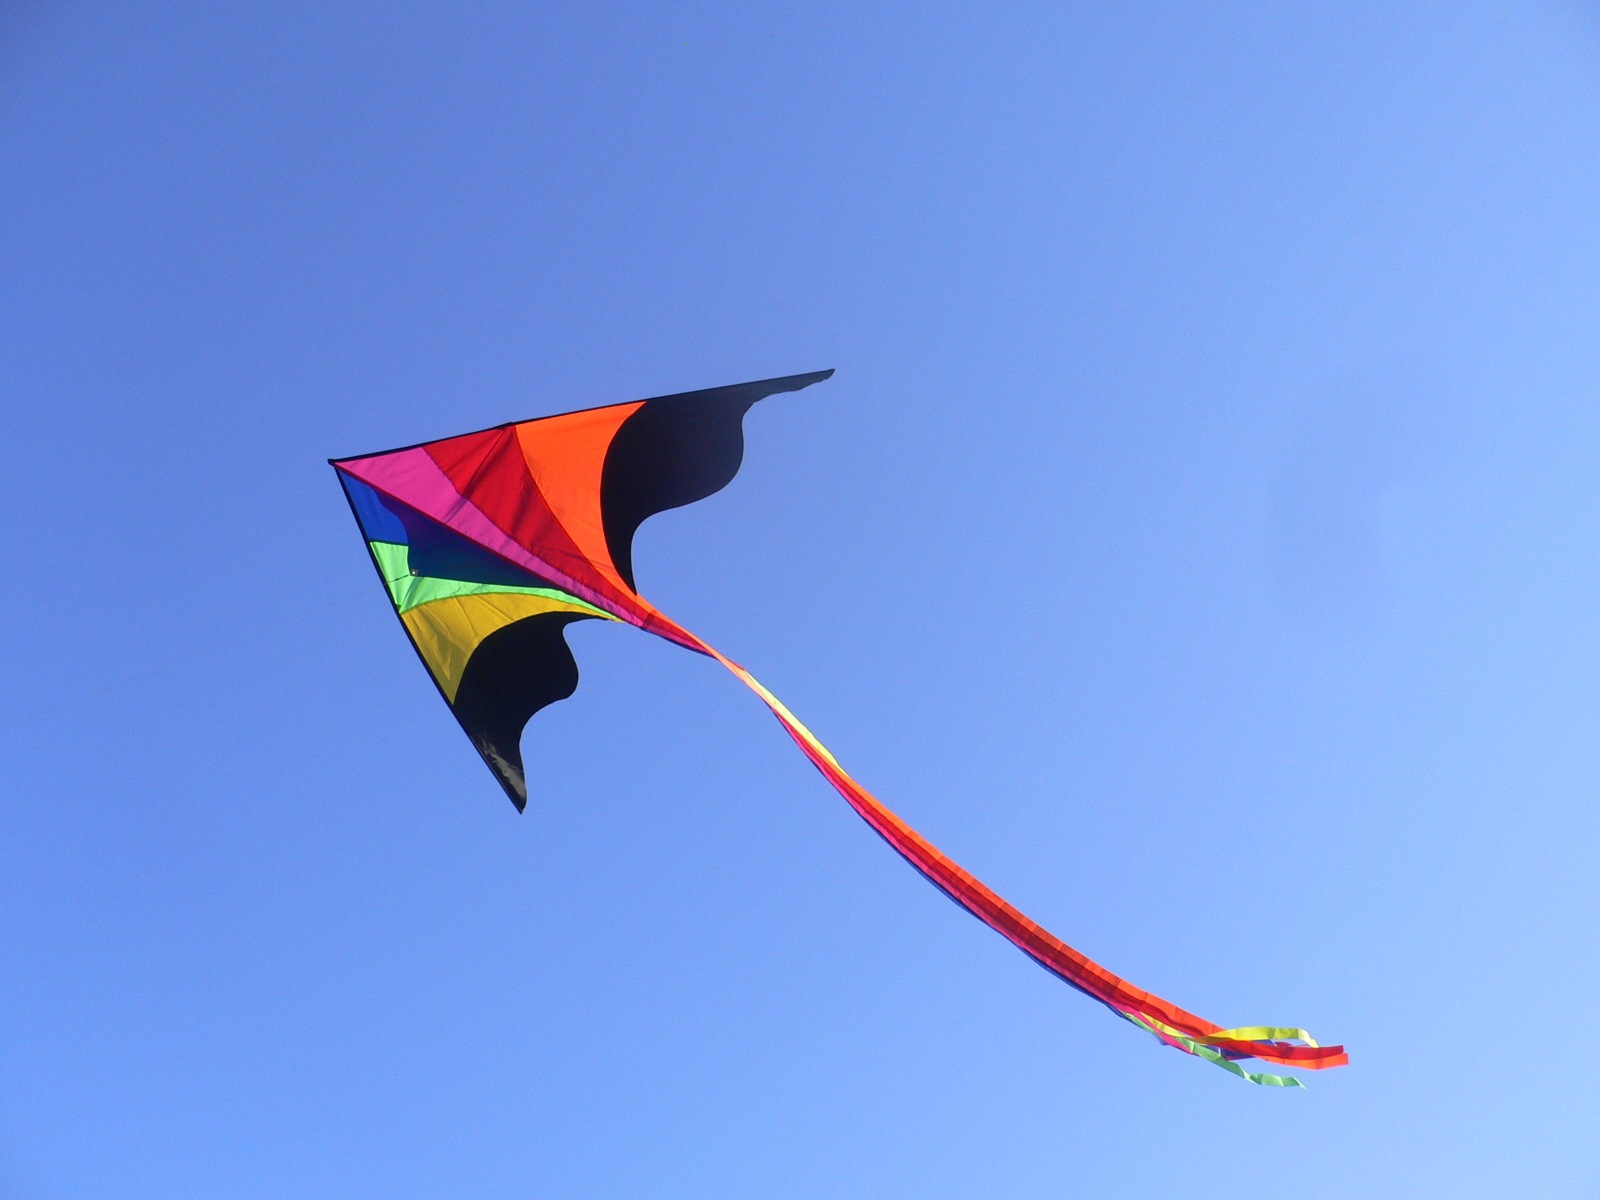 летающий змей фото